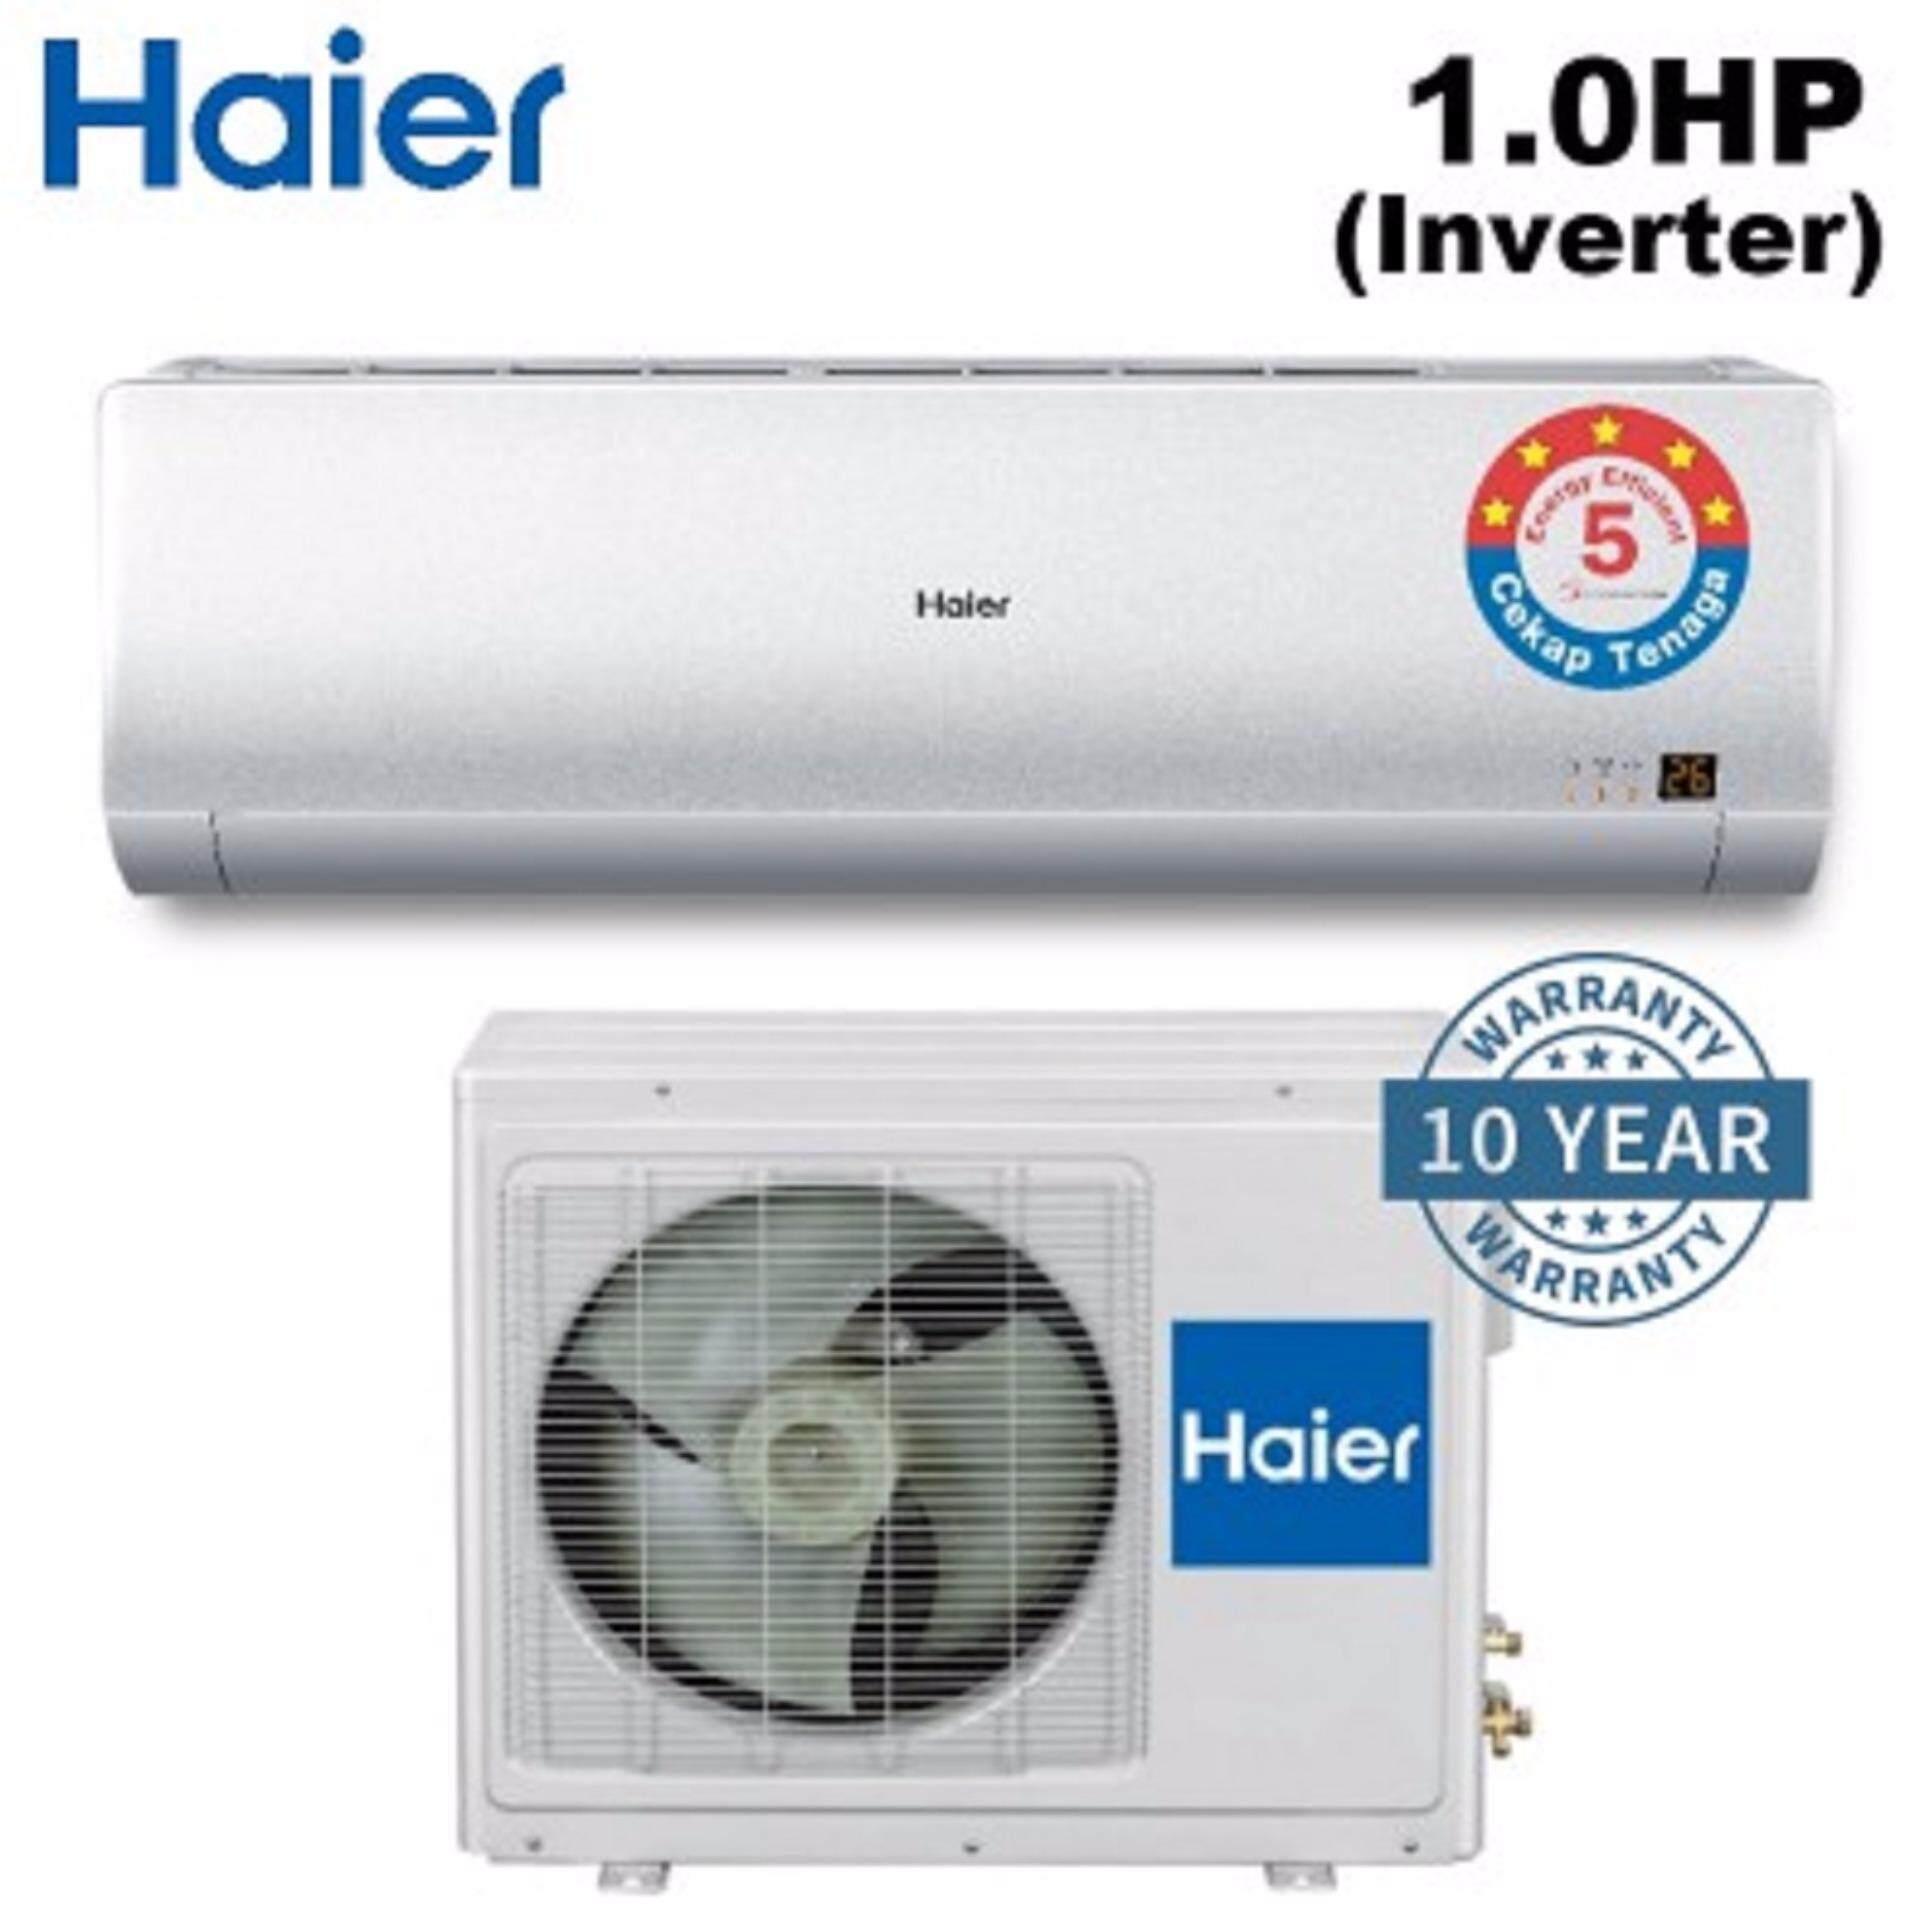 HAIER 1.0HP AIR CONDITIONER HSU-10VNH16